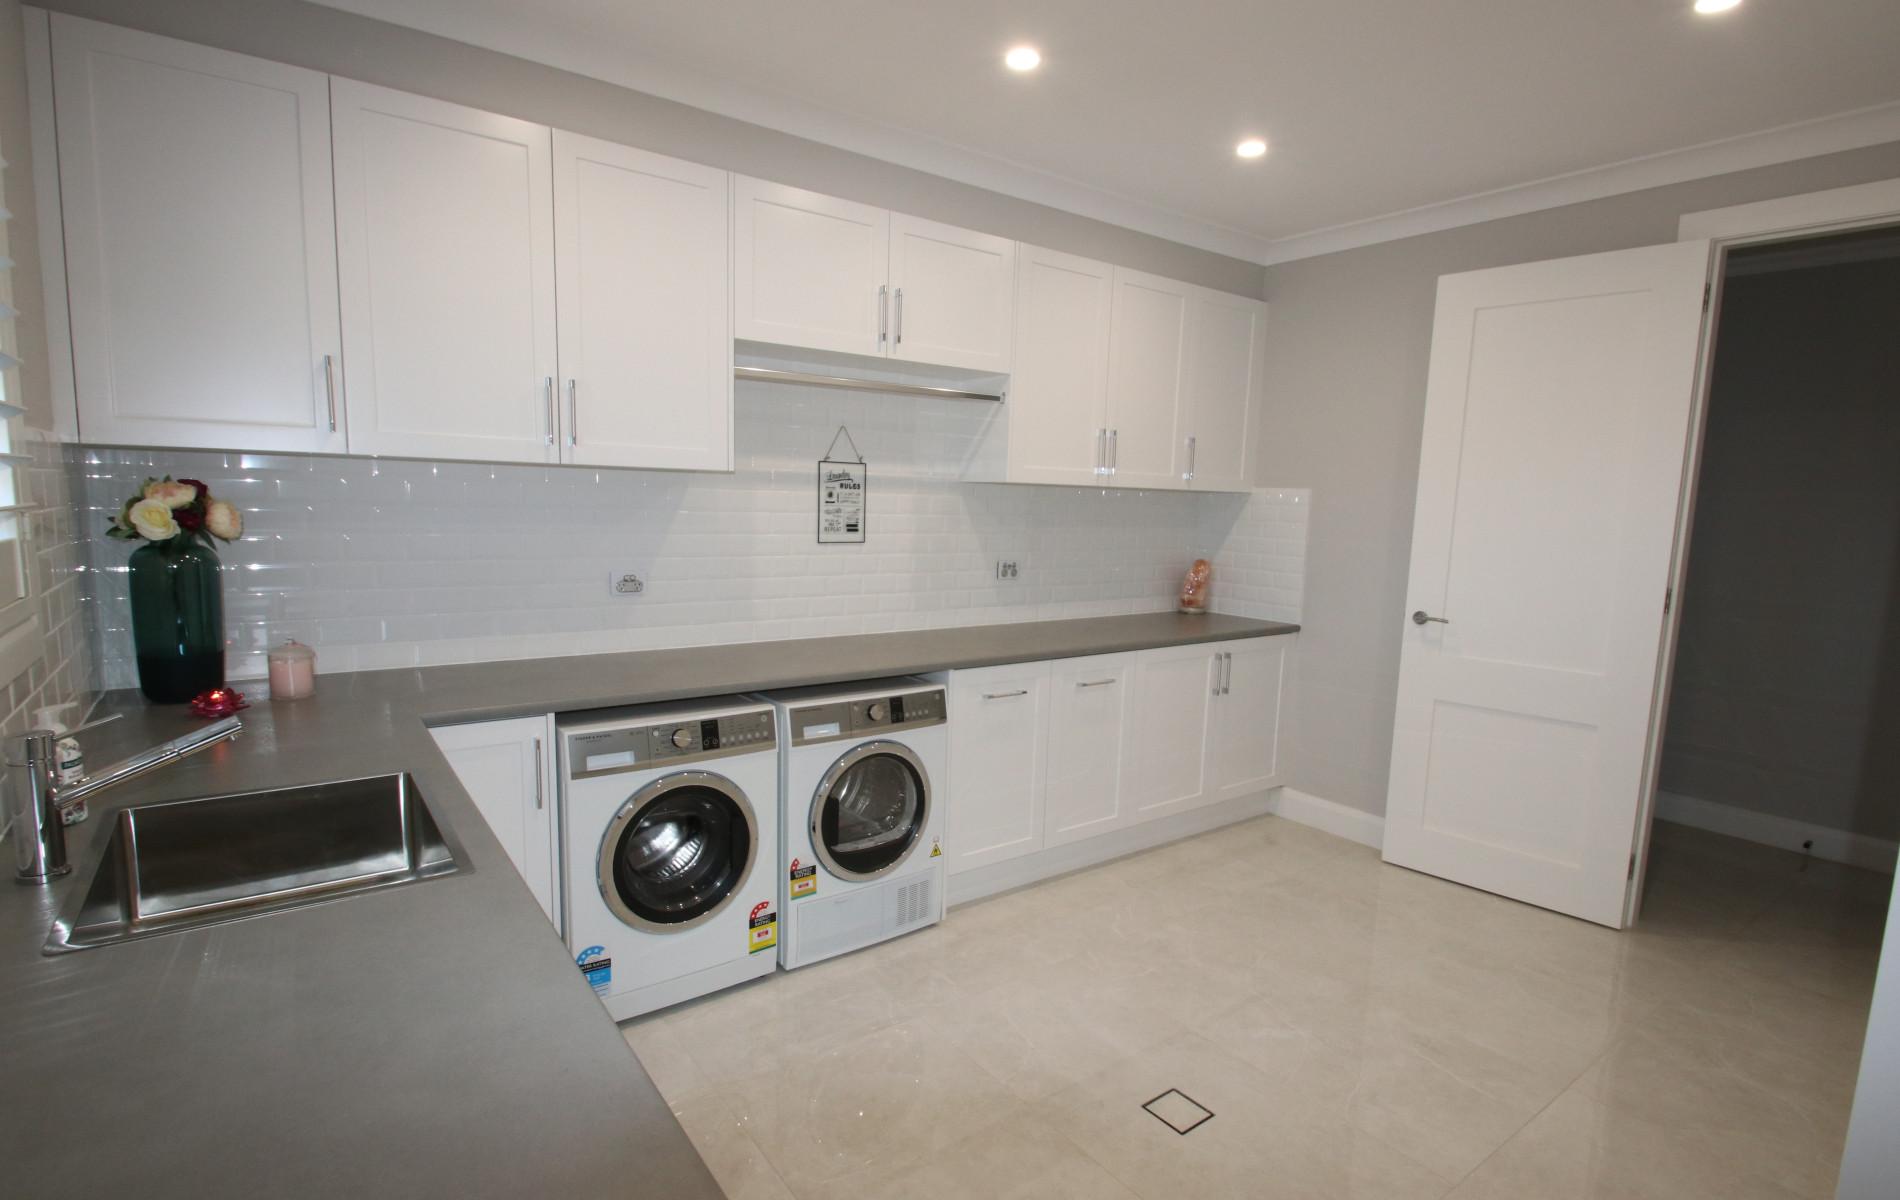 Laundry-Karen-Wallace-IMG_1830